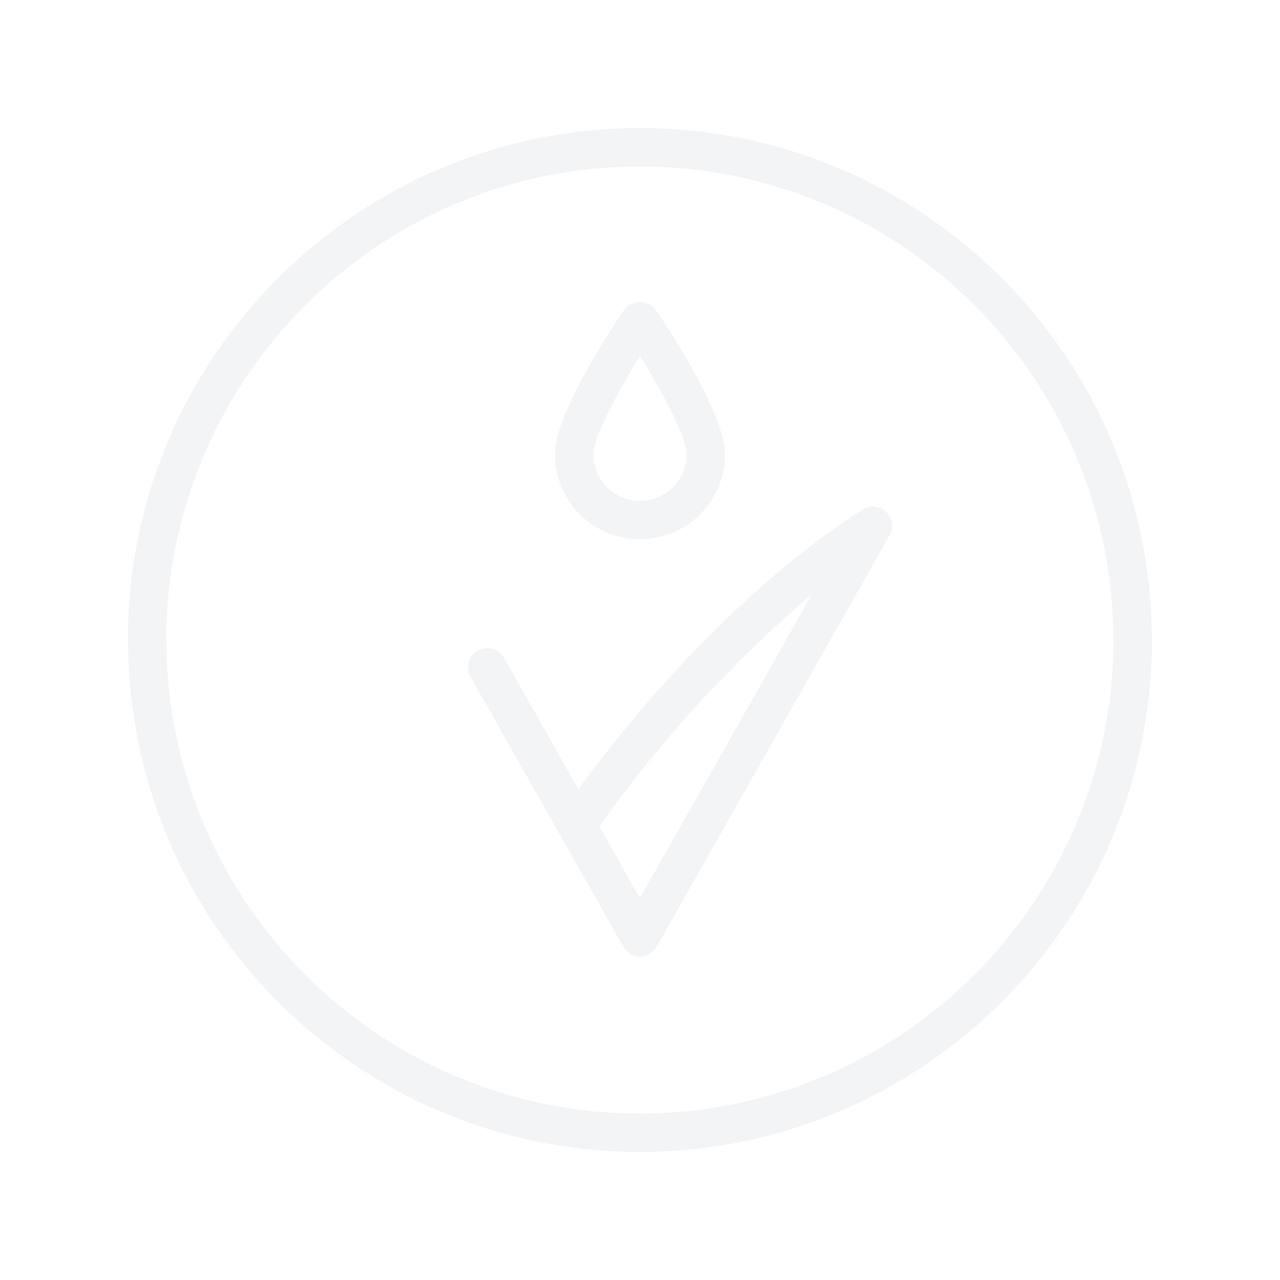 NATURA ESTONICA BIO Extreme Repair Hair Mask 200ml